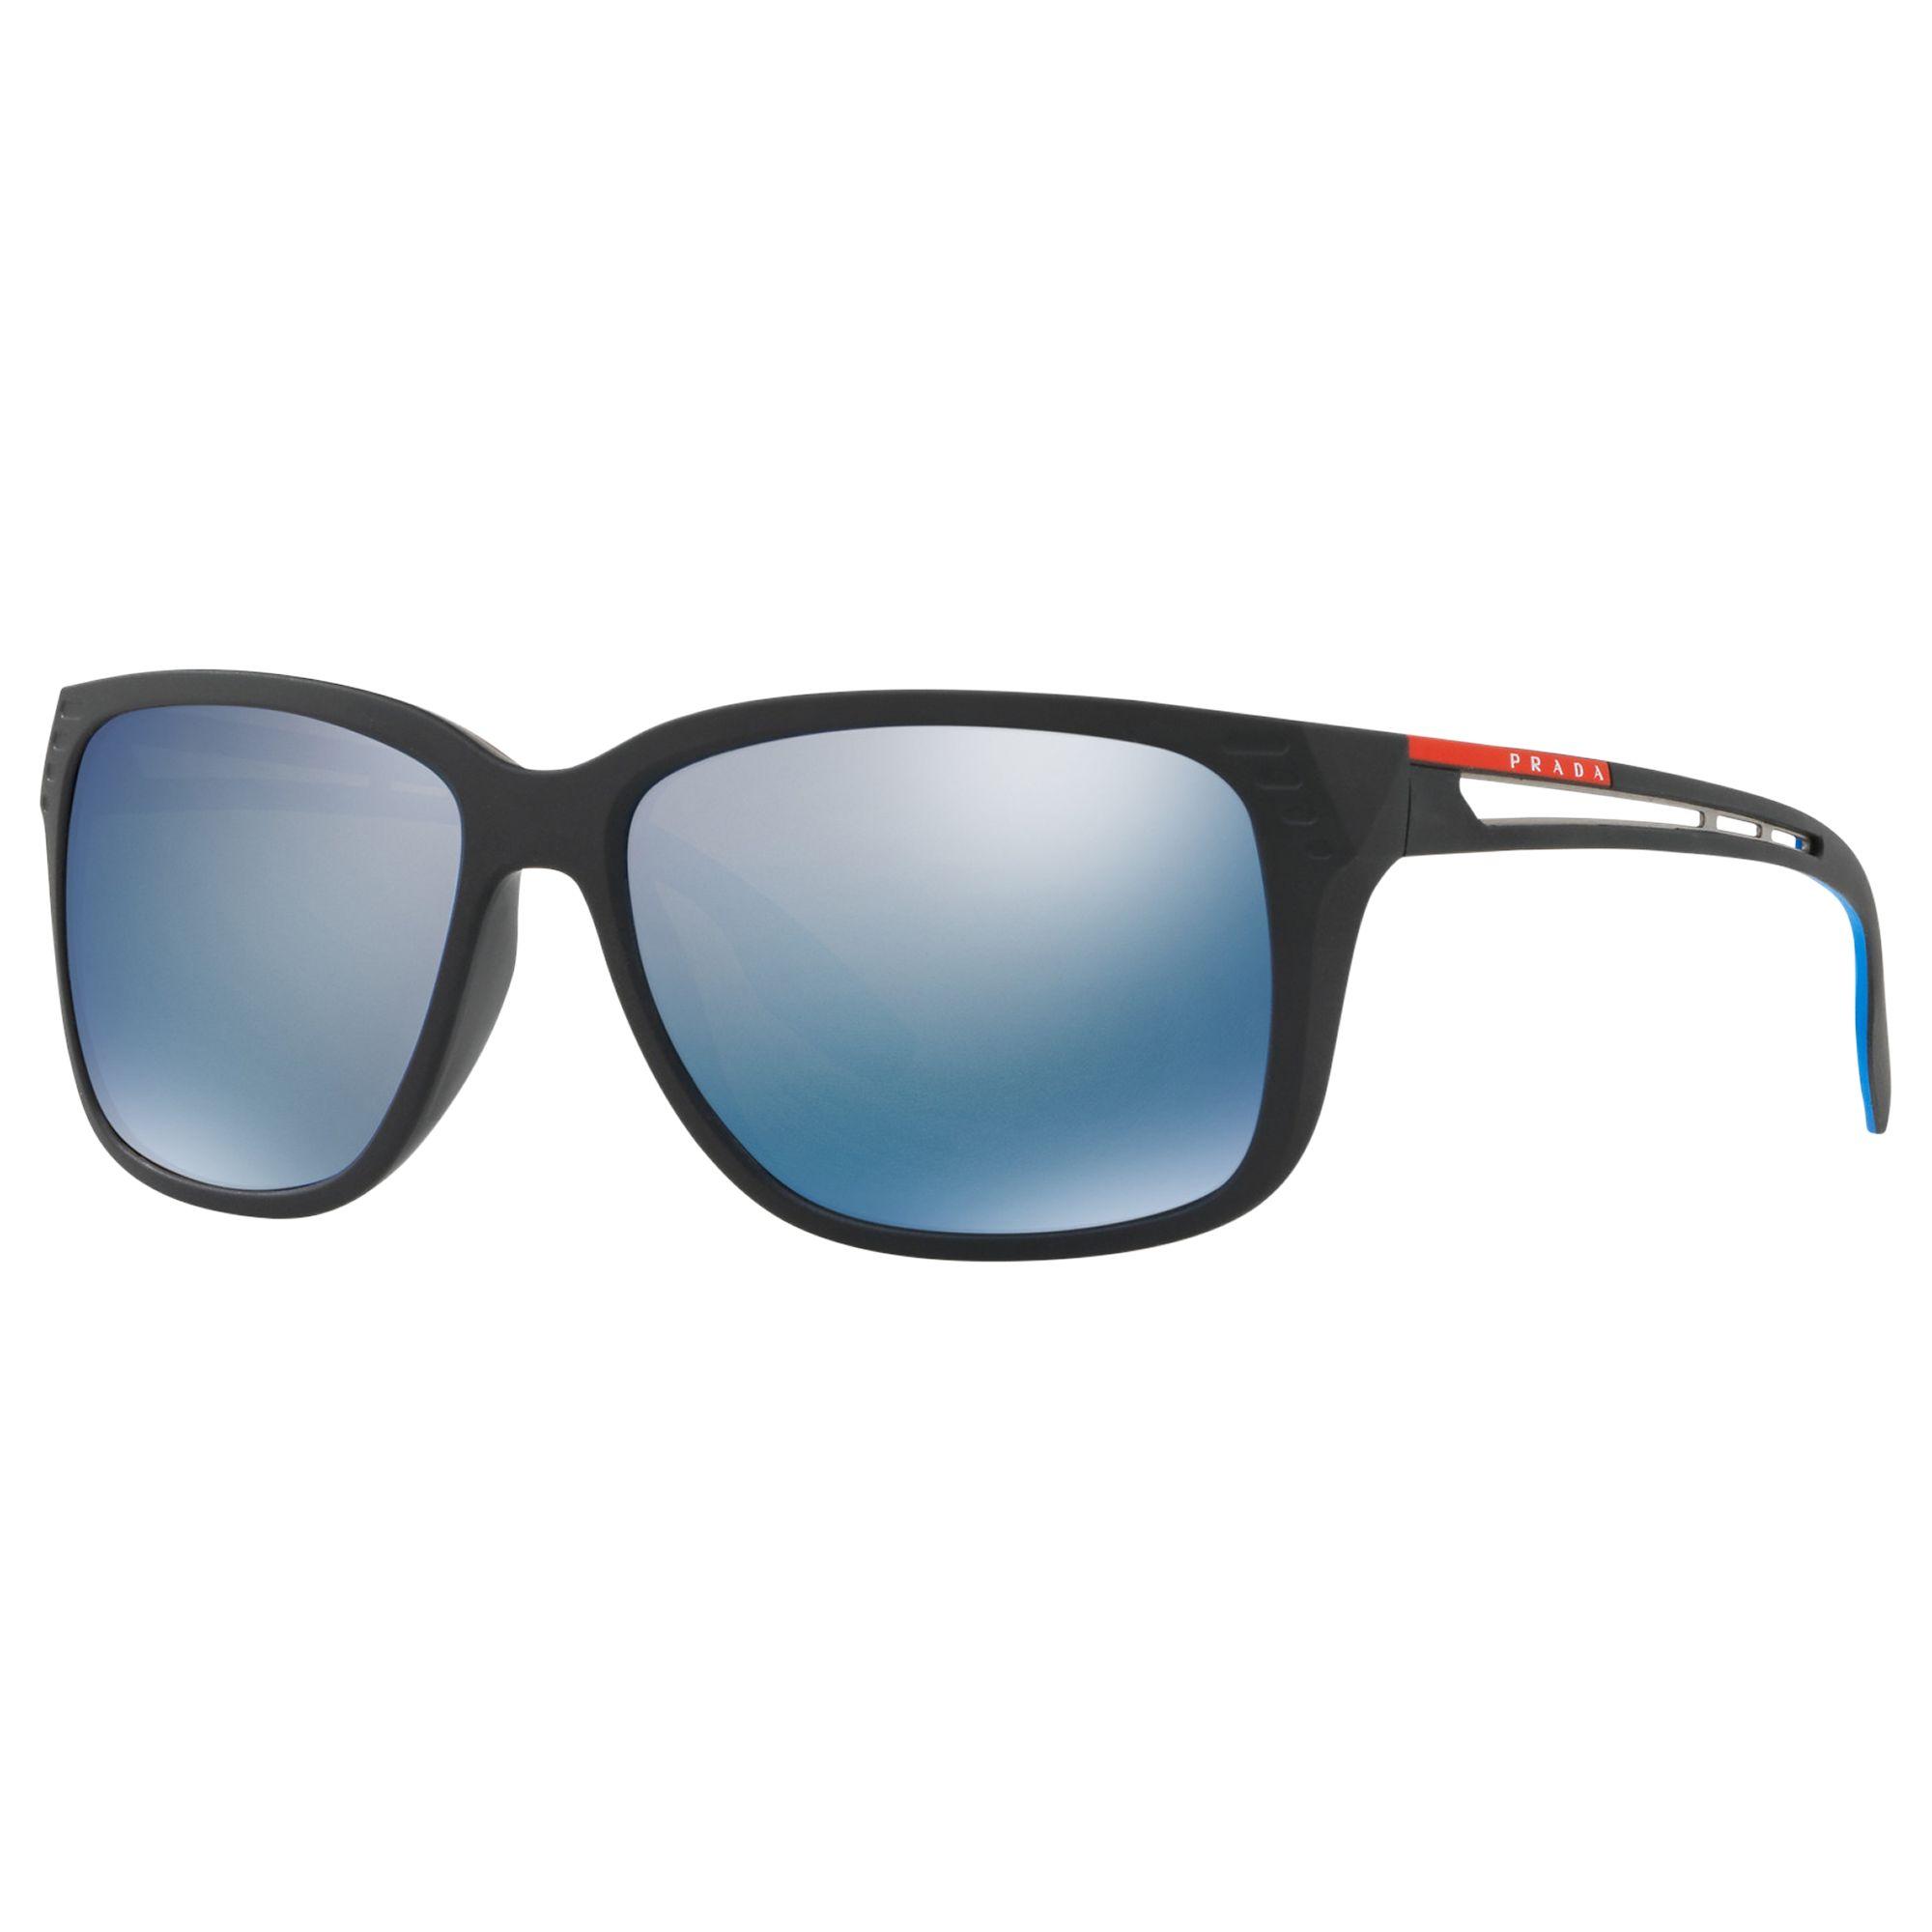 d2b19027440c Prada Linea Rossa PS 03TS Men s Polarised Rectangular Sunglasses at John  Lewis   Partners